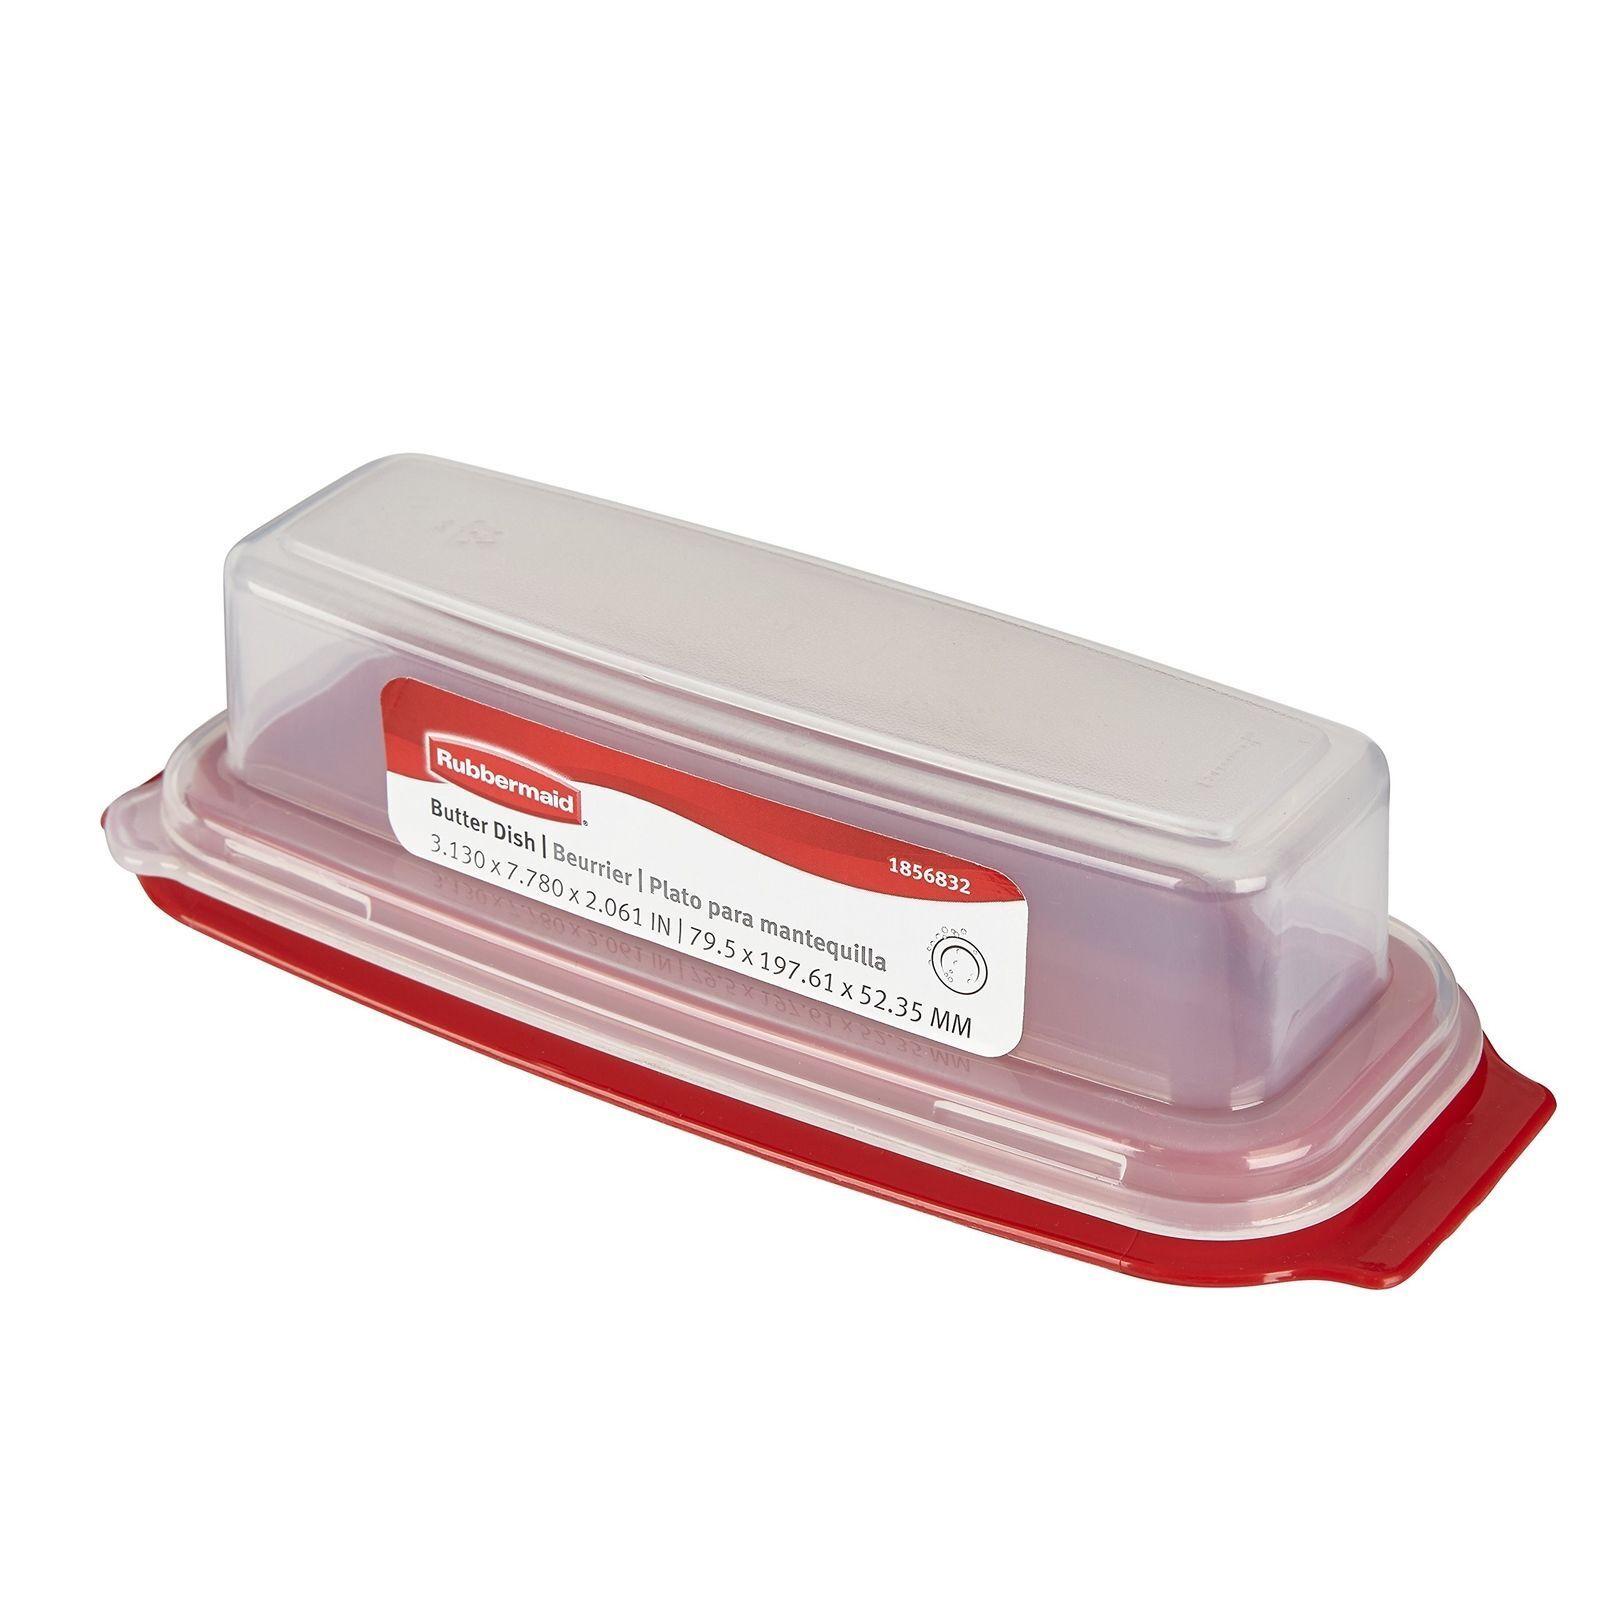 Rubbermaid White Plastic Butter Dish 3930-RD-CLR